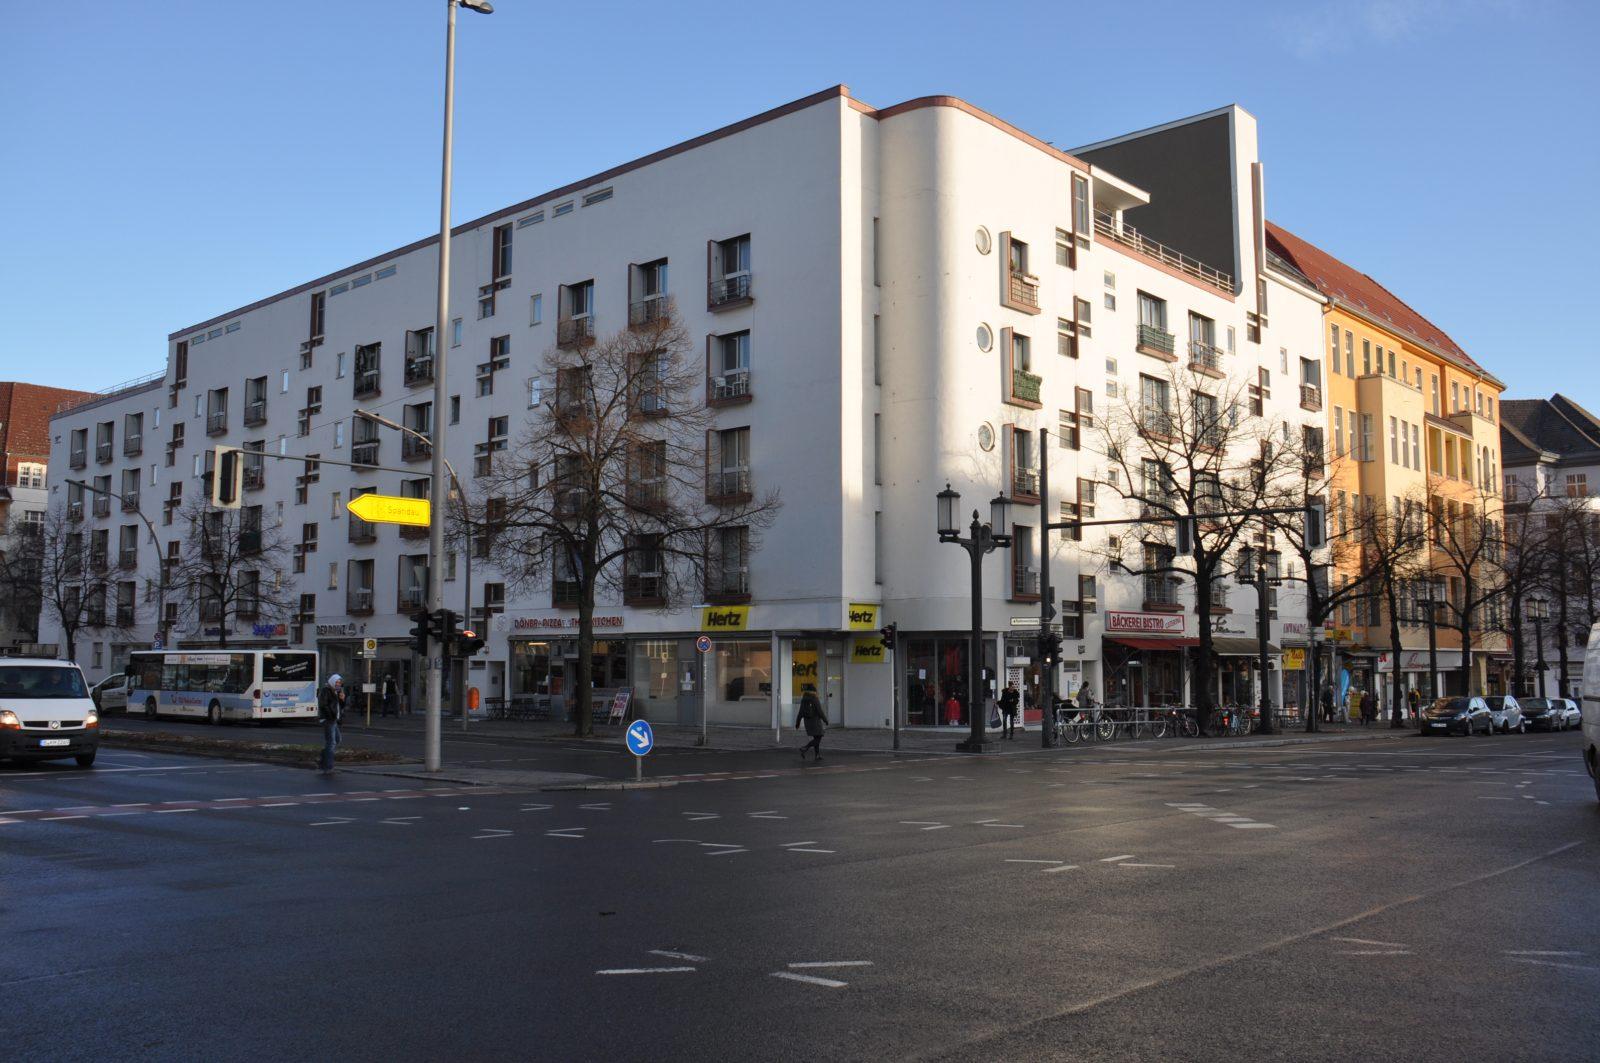 Abbildung: Apartmenthaus, Berlin, Kaiserdamm 25, Architekt: Hans Scharoun, 1929, Foto: 2019, BEST